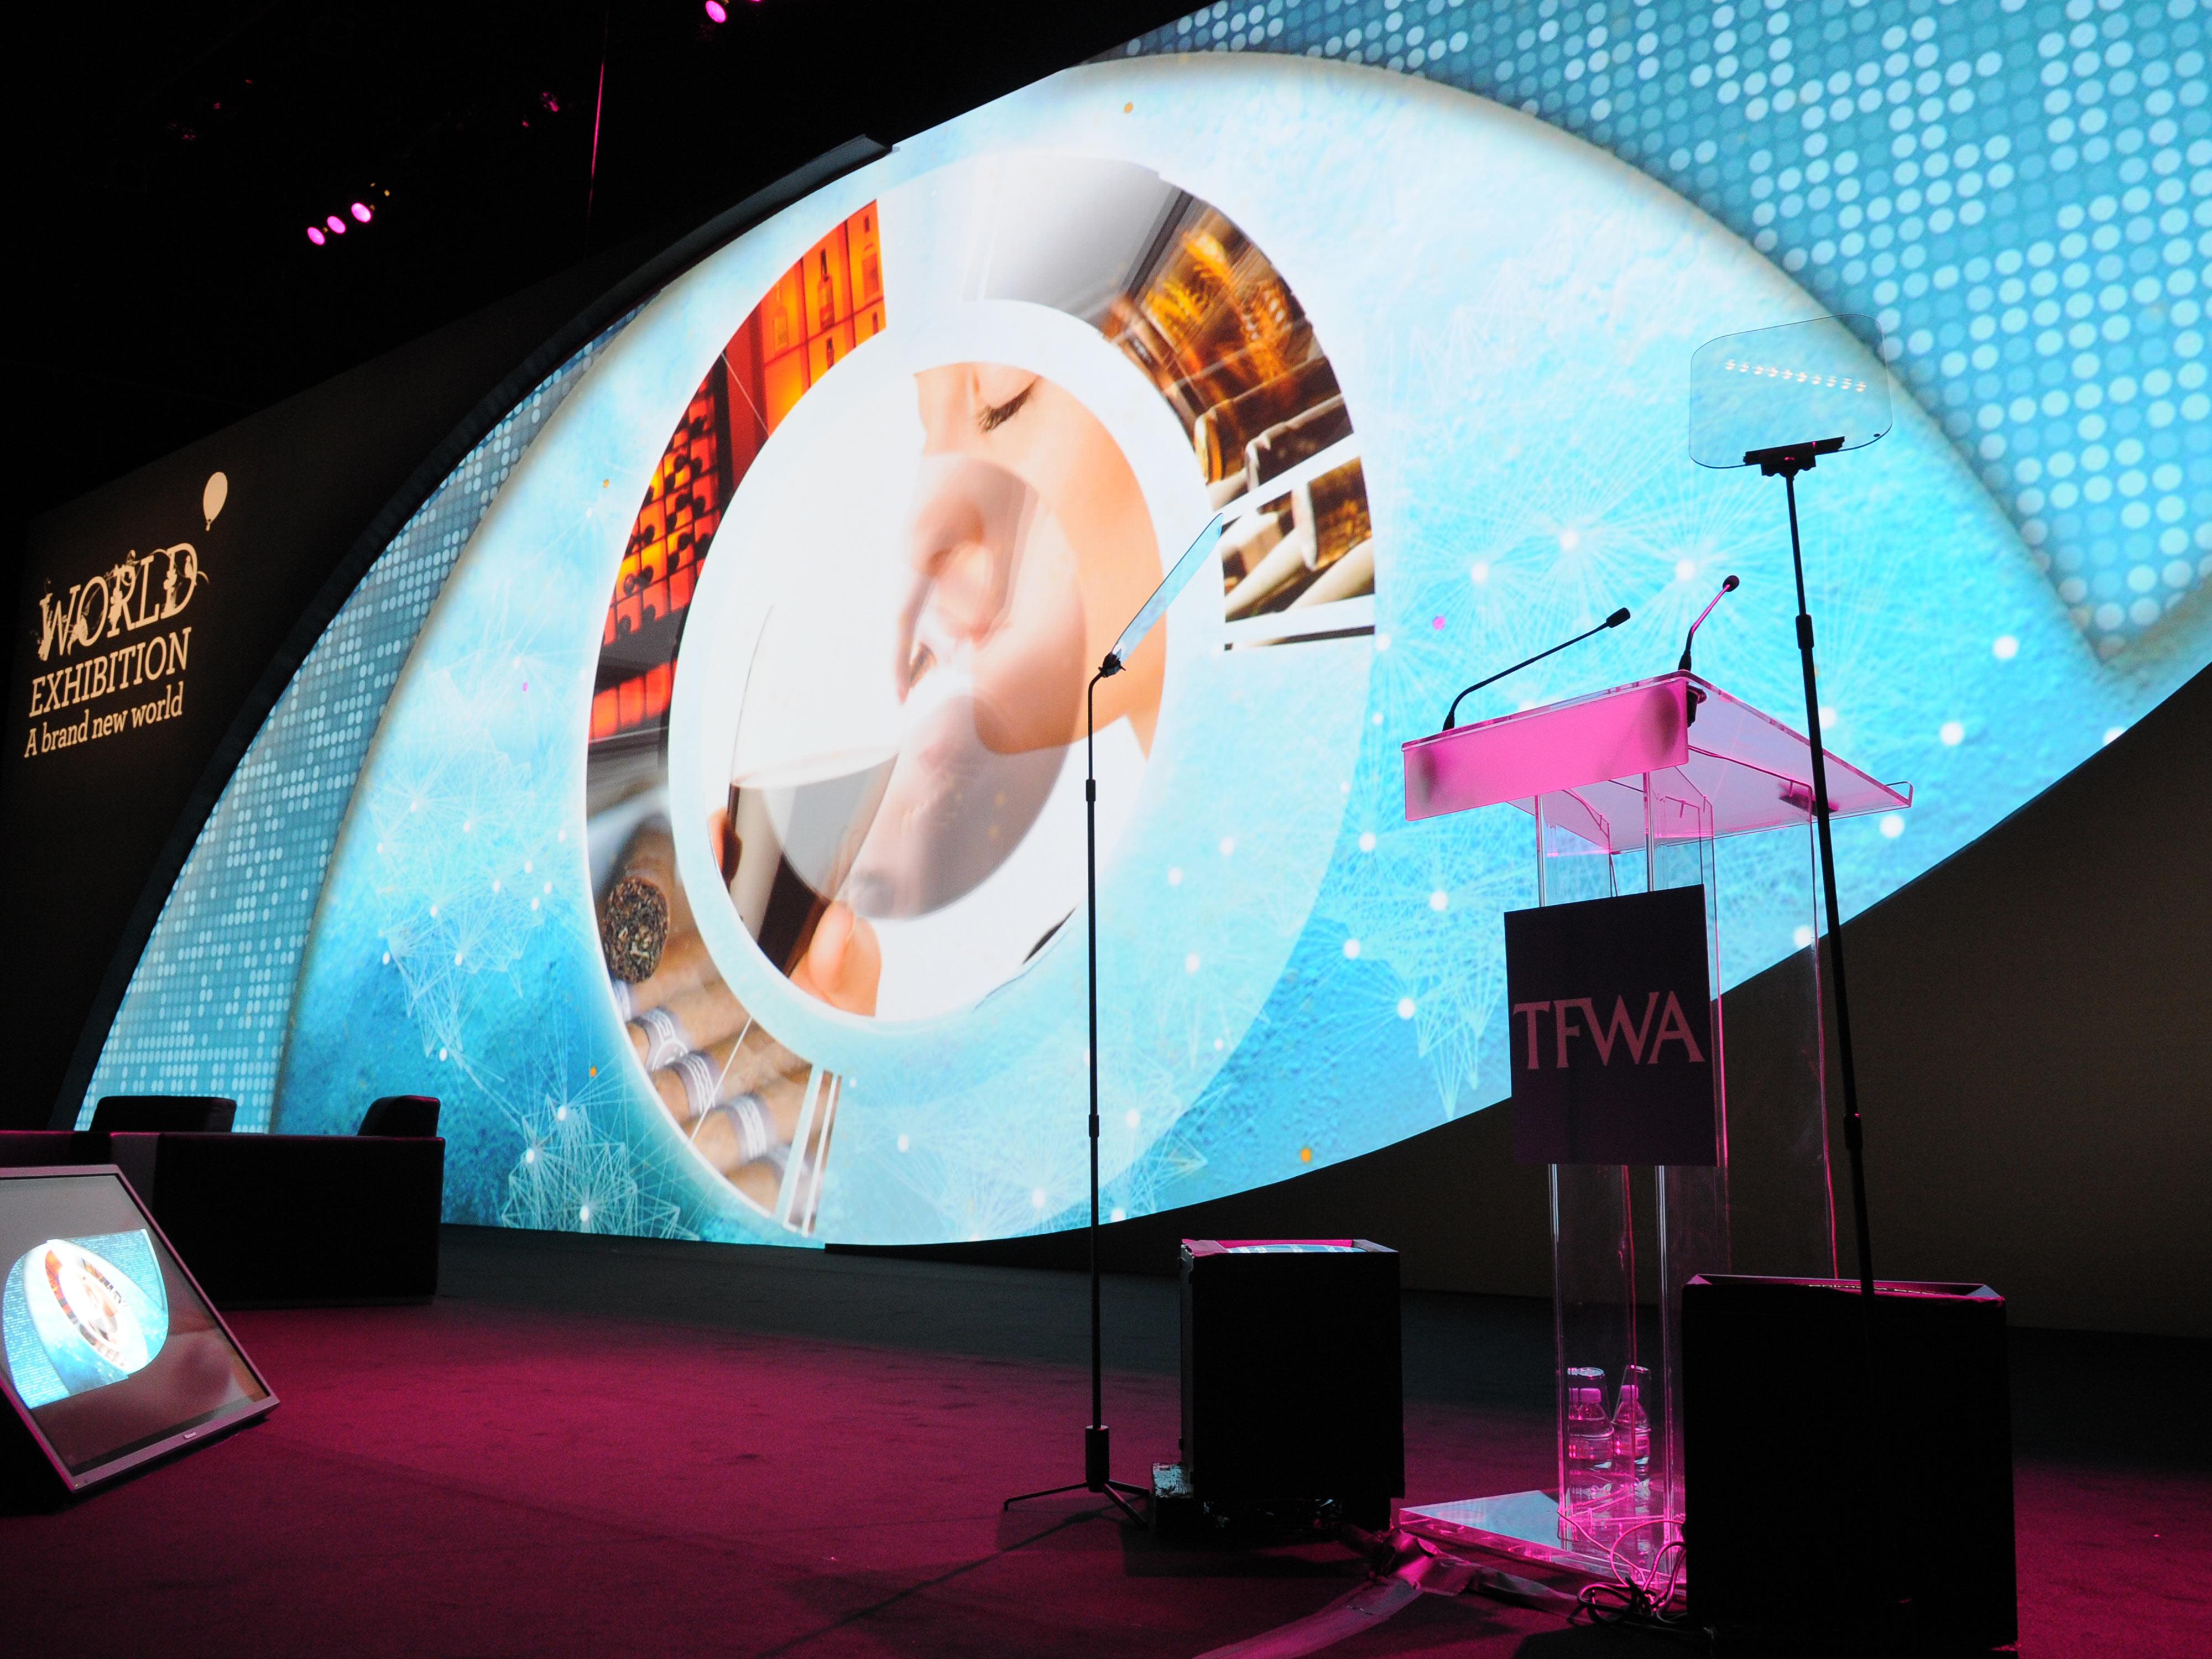 TFWA Opening - Creative Spirit 2011